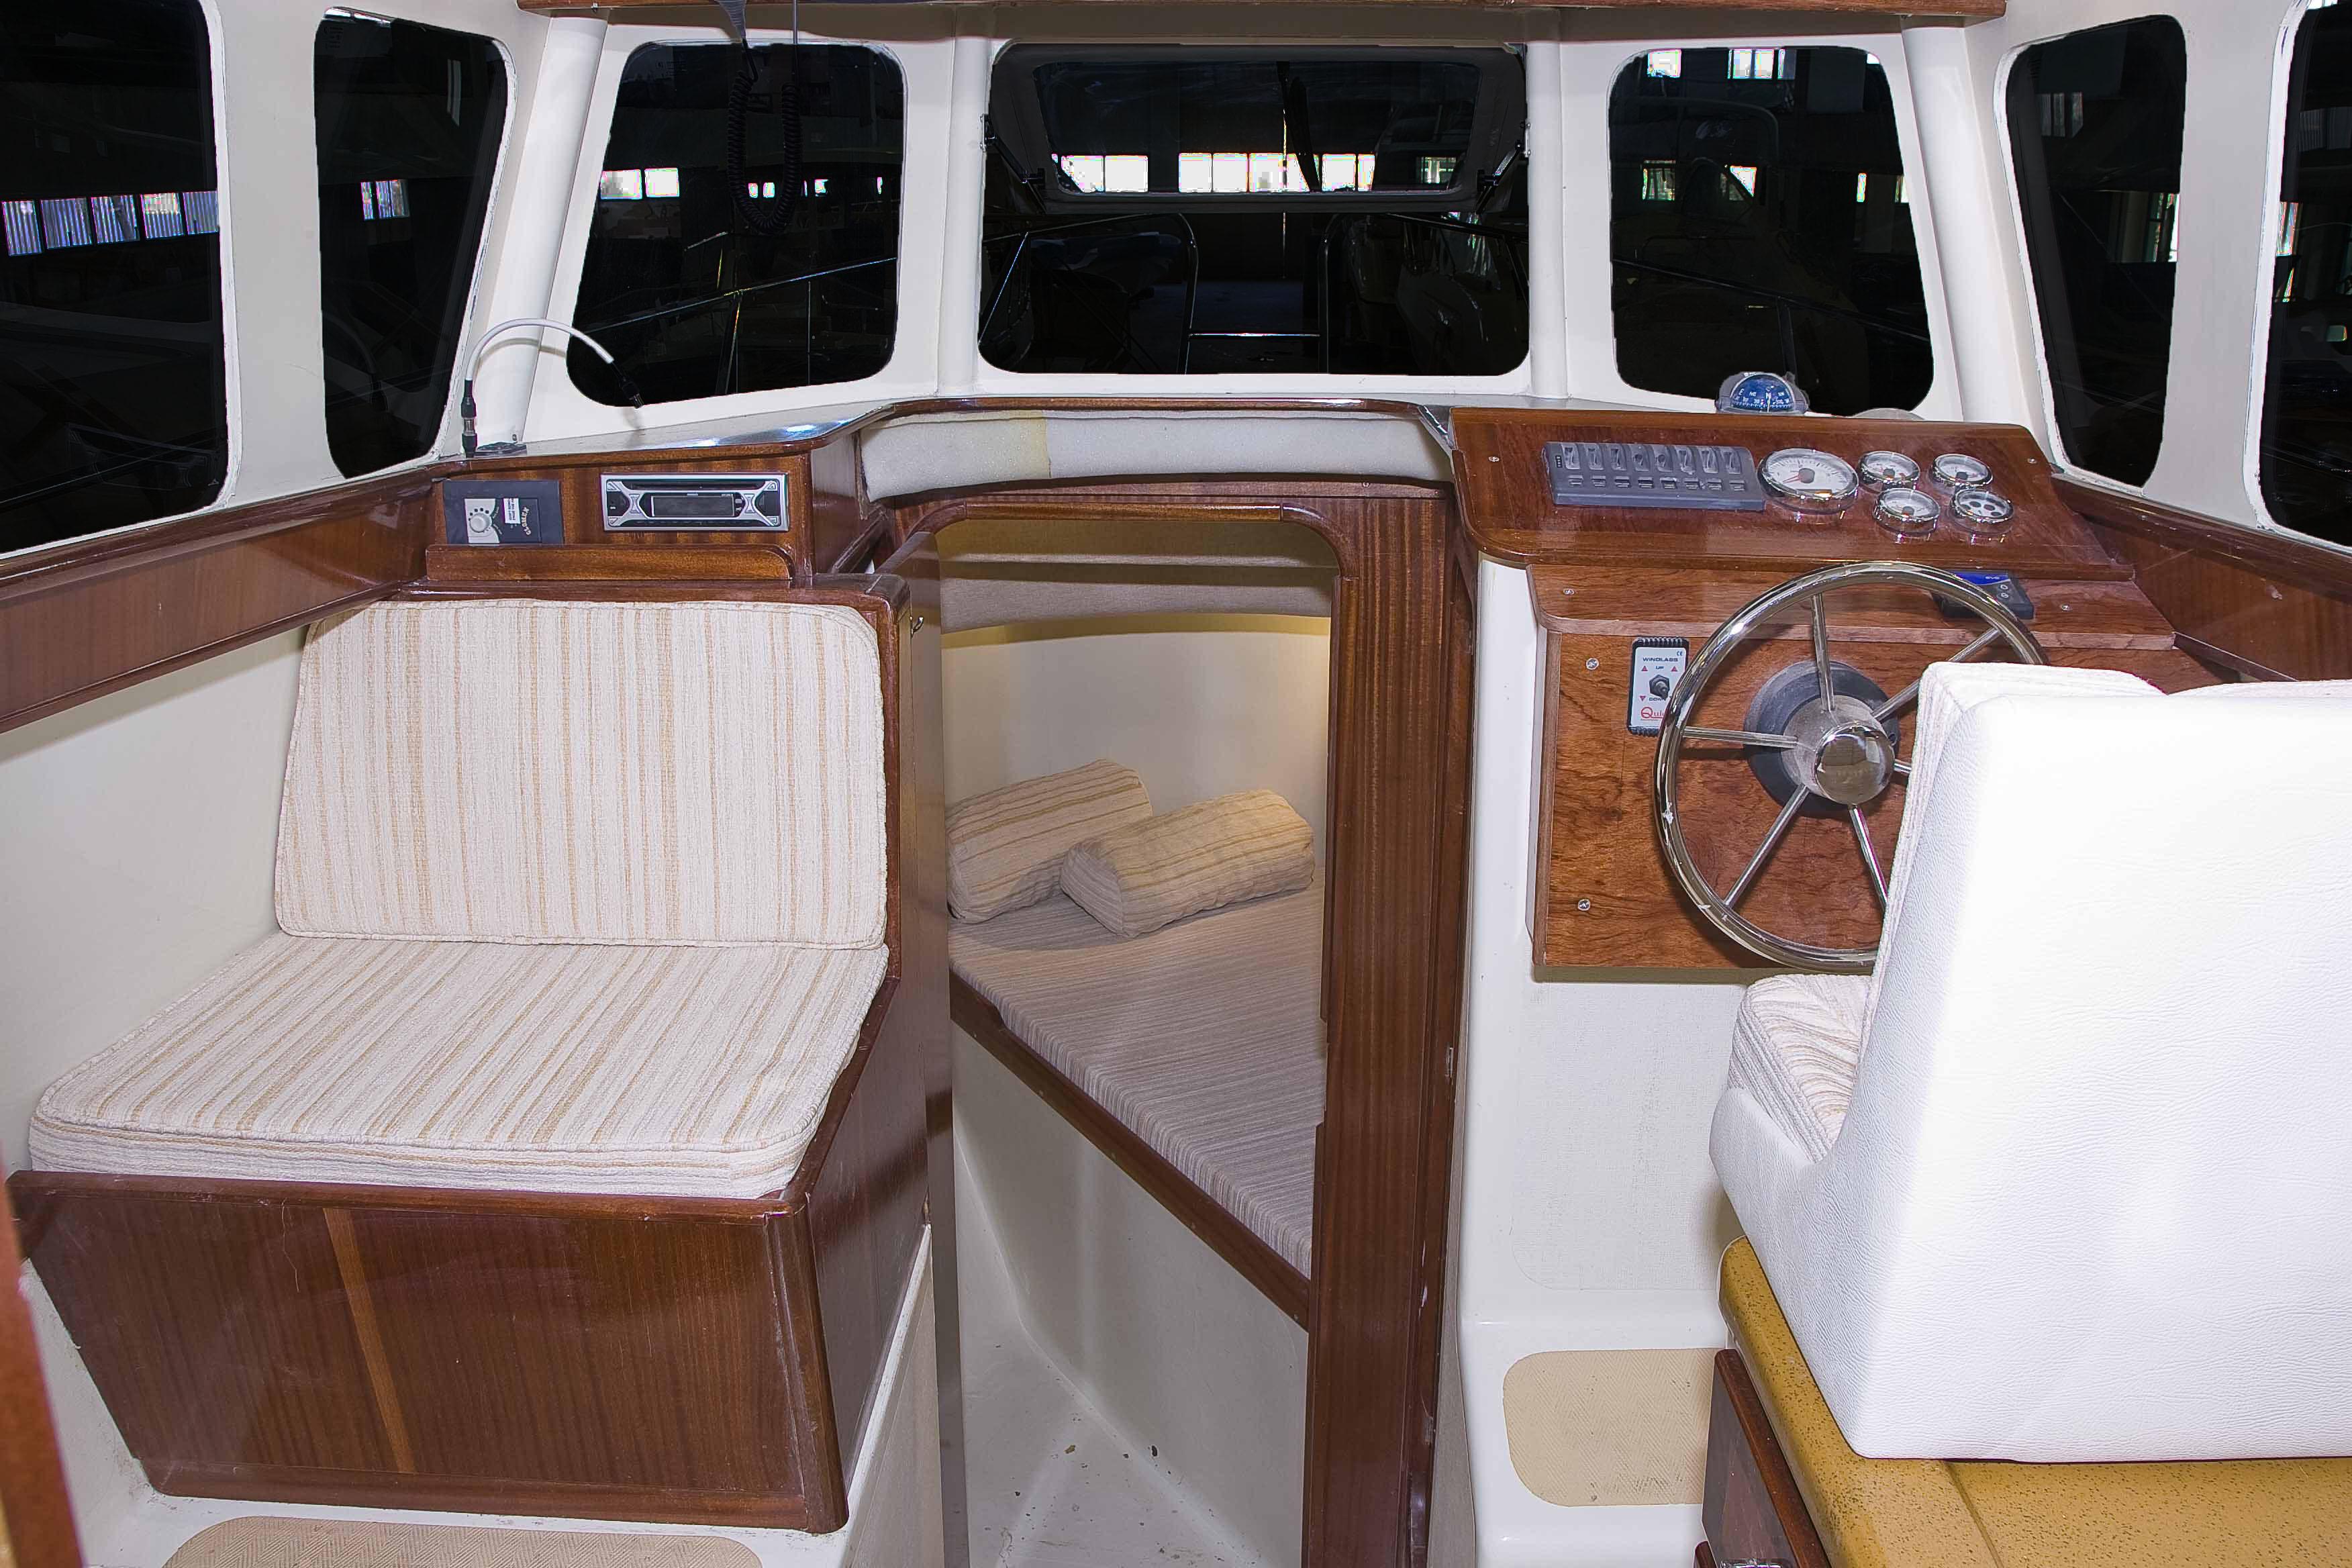 Tacar Mini Trawler interior cabin